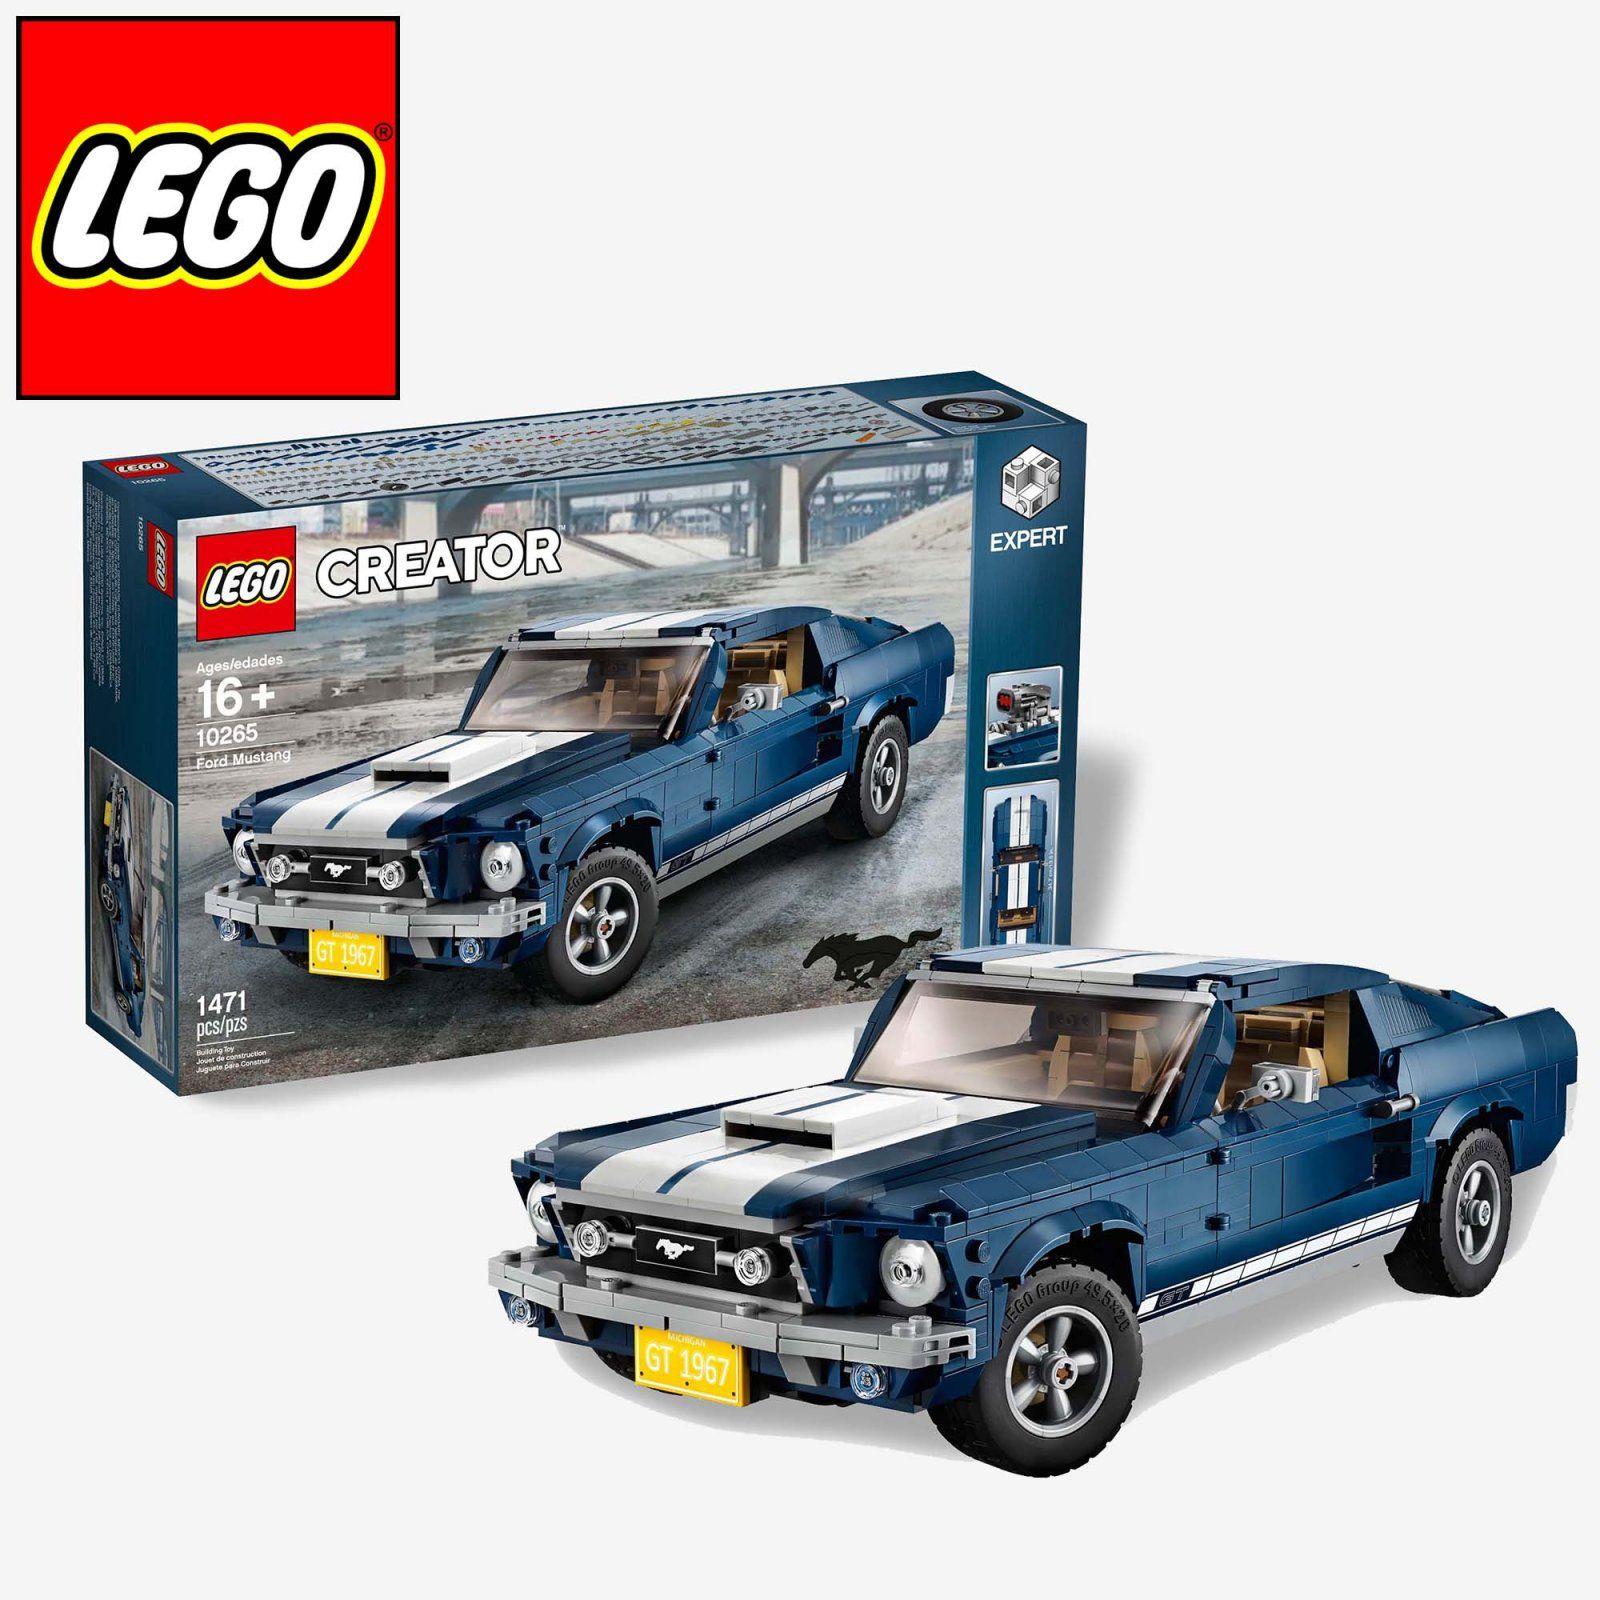 Lego 10265 Creator Expert Ford Mustang - £96 @ Jarrold